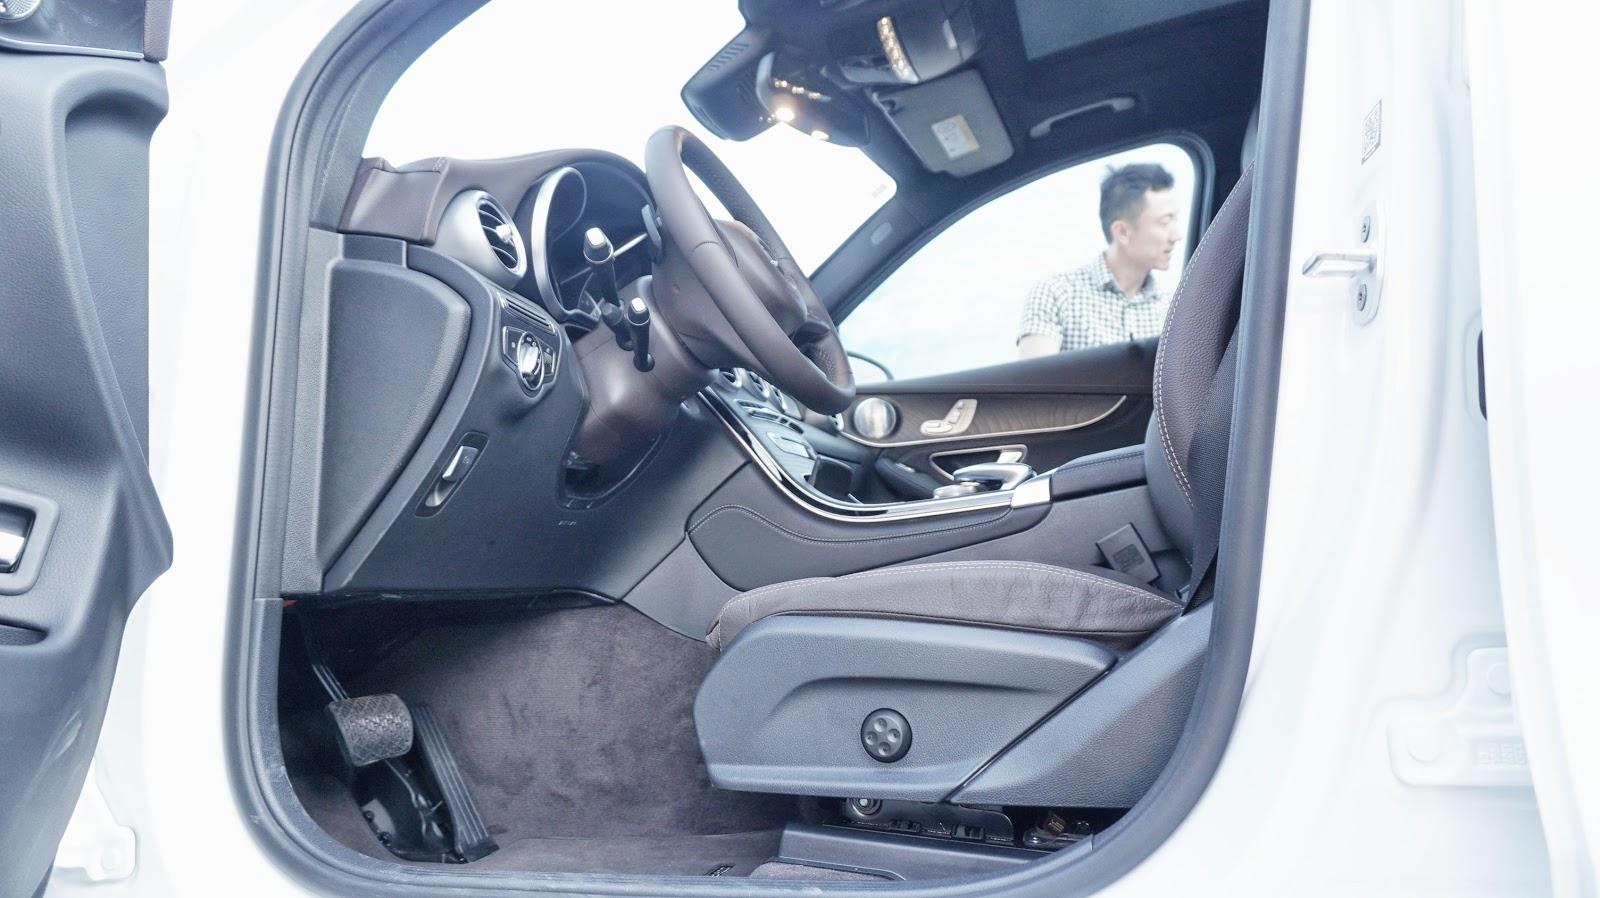 Cận cảnh Mercedes-Benz GLC 300 4Matic 2016